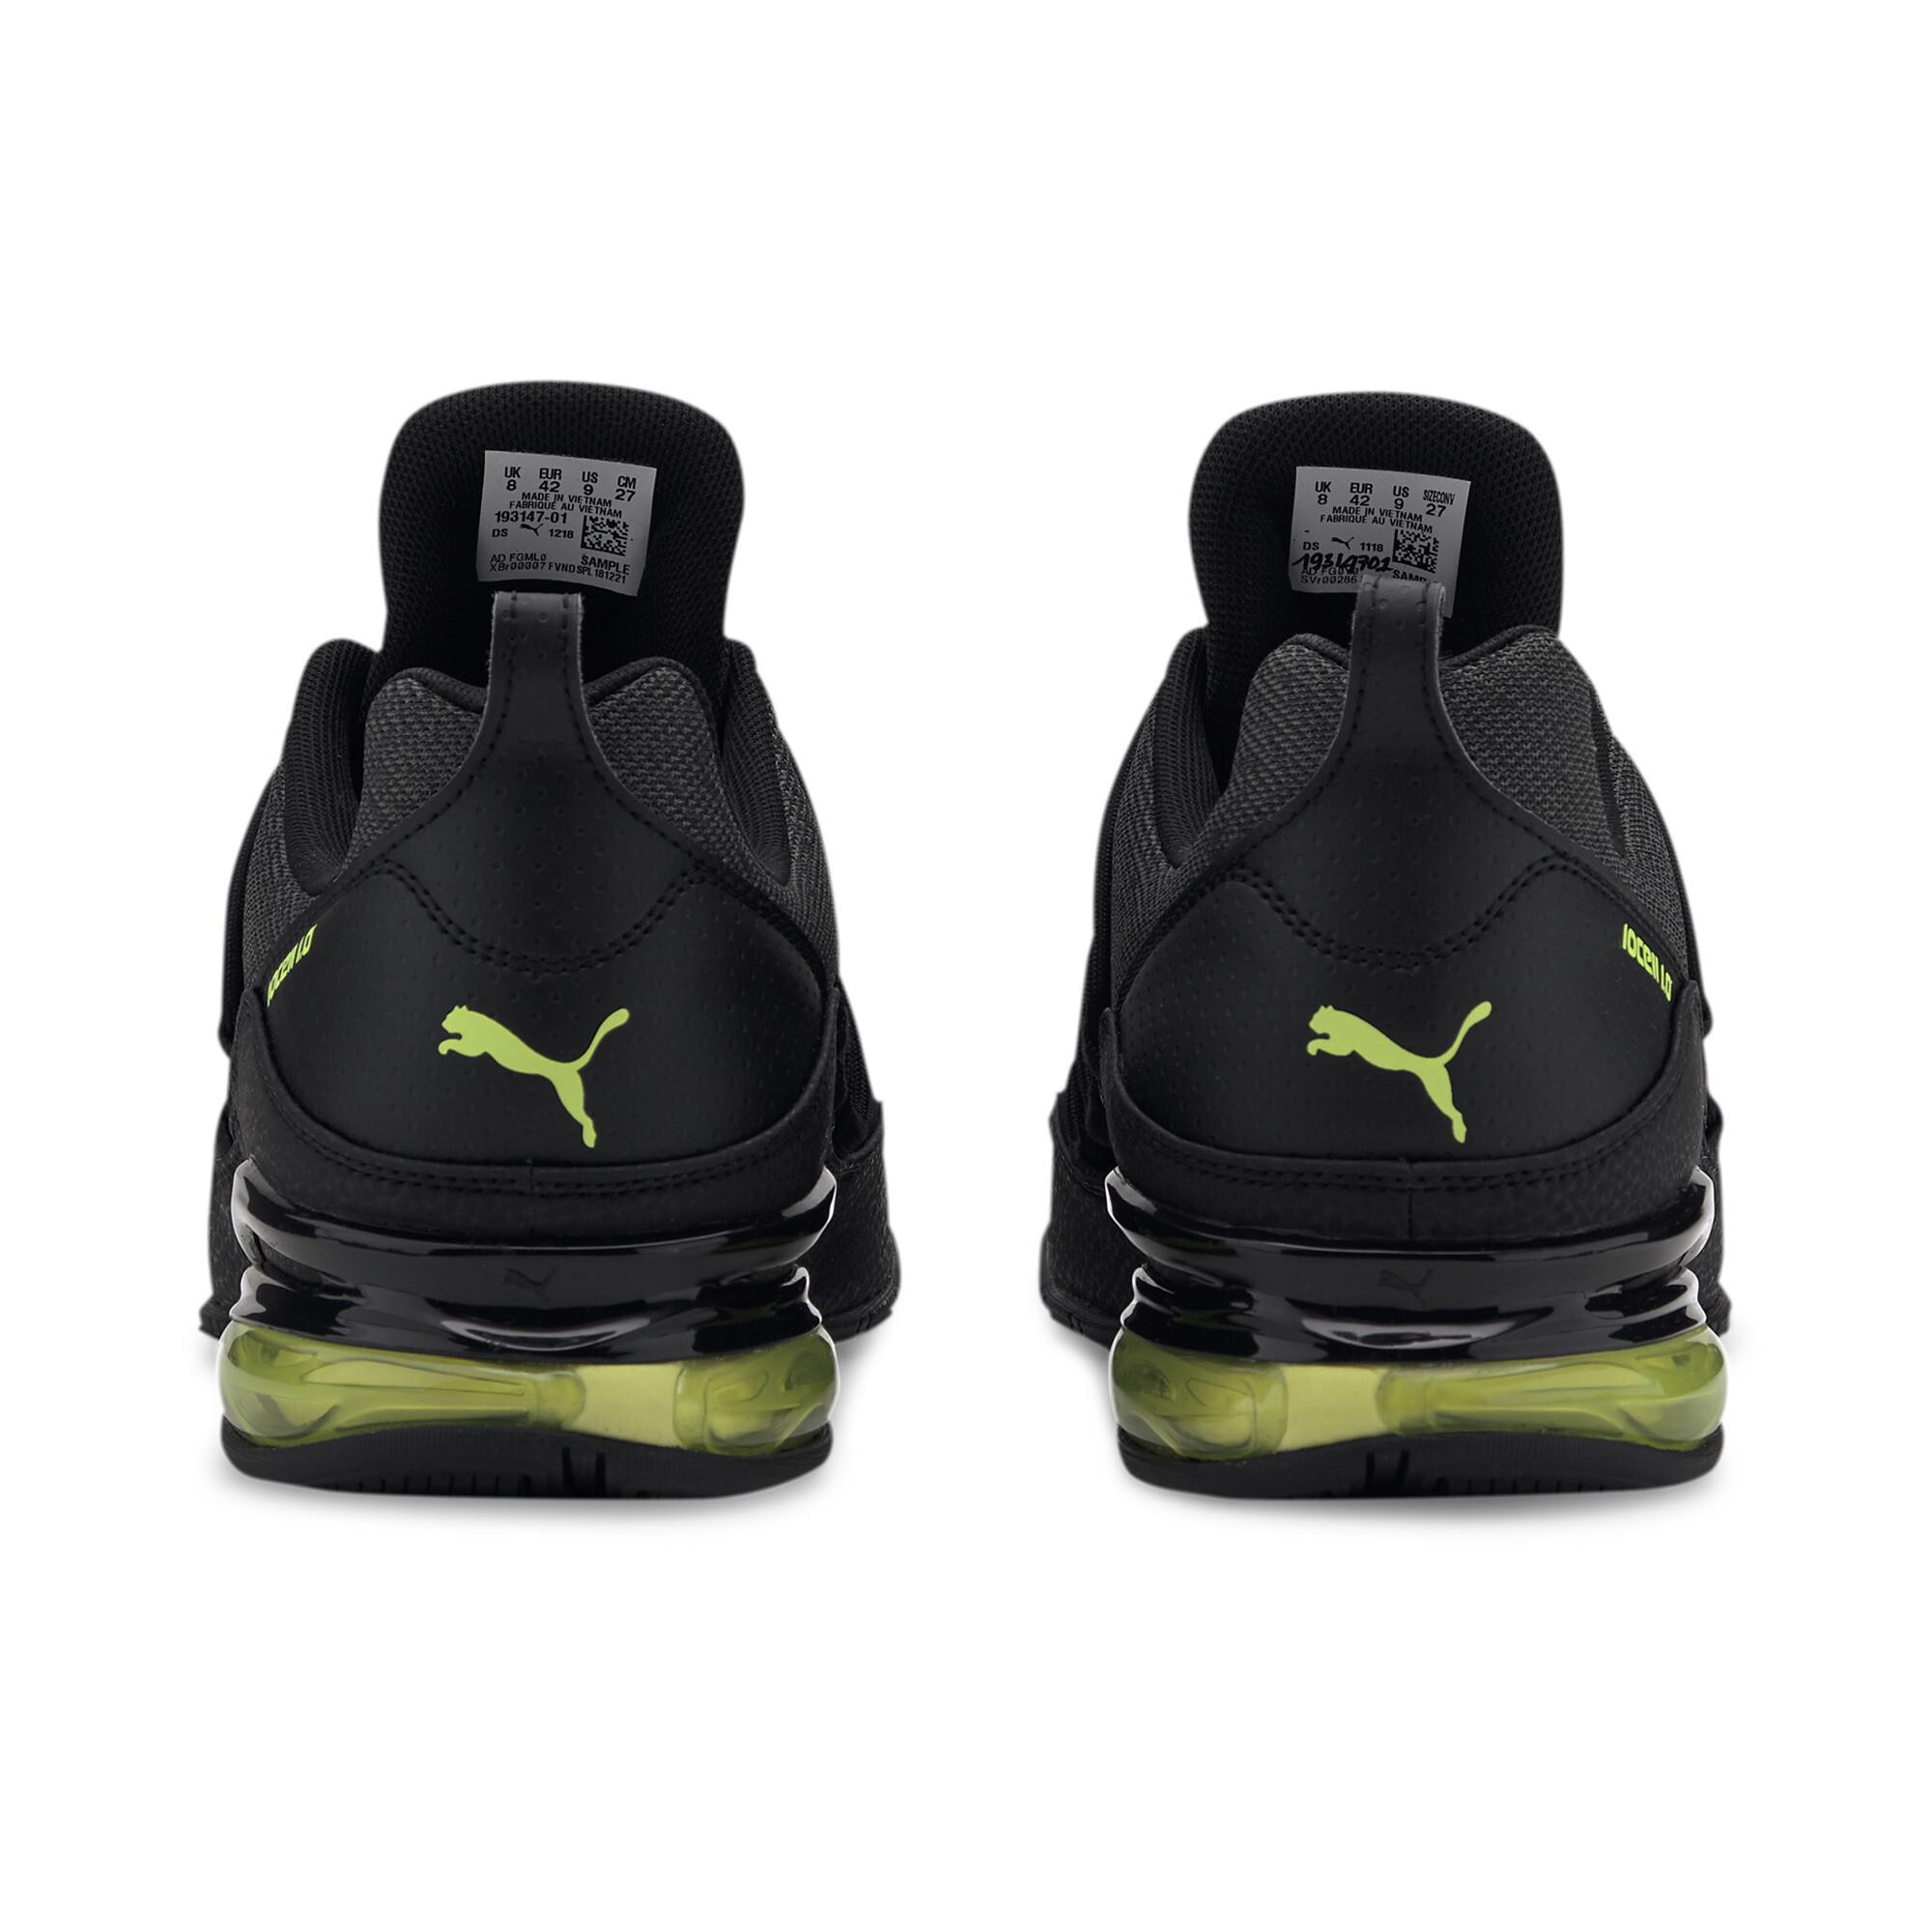 PUMA-Men-039-s-CELL-Regulate-Bold-Training-Shoes thumbnail 17